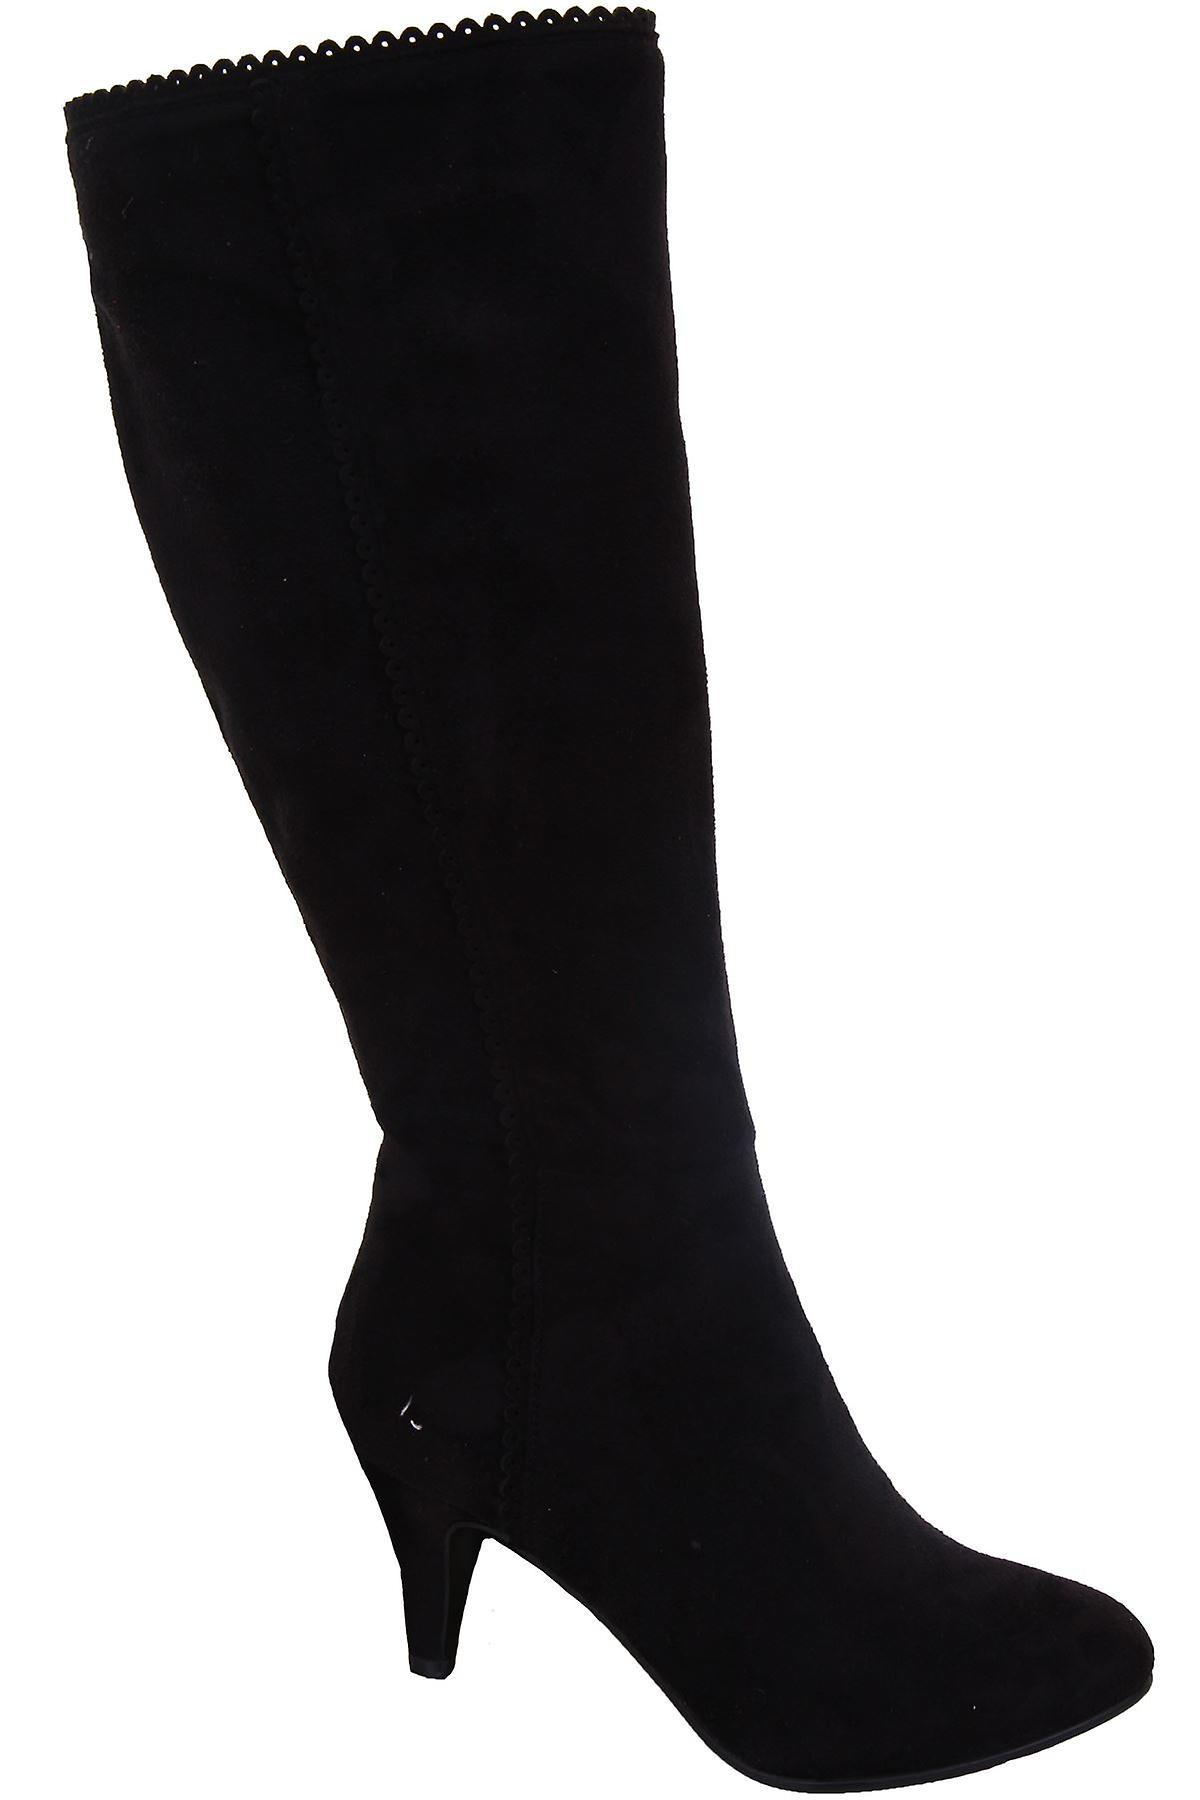 Ladies Scallop Trim Pointed Toe Black Suede Women's High Knee Boots Heels